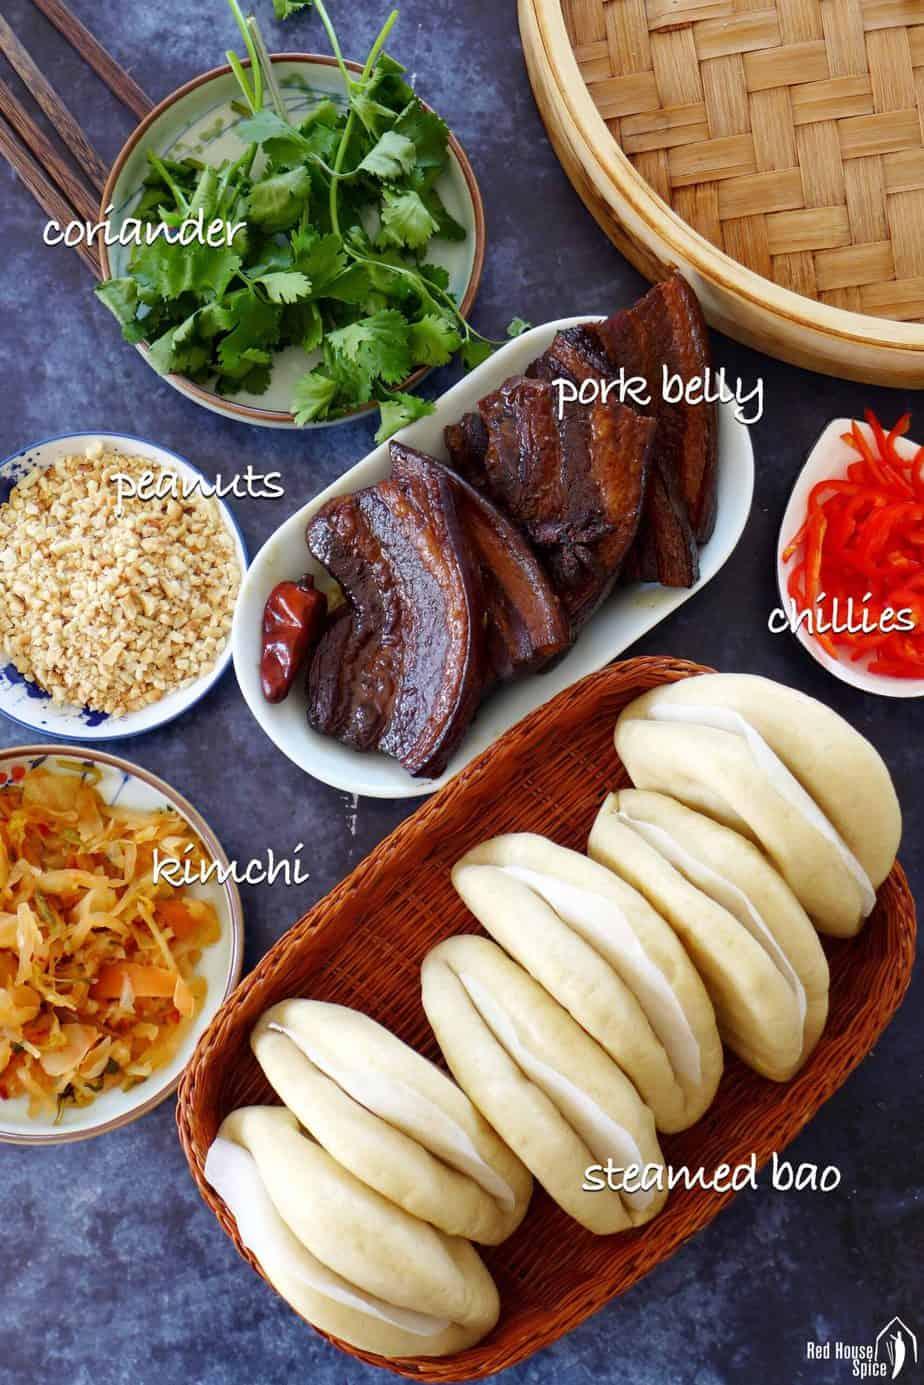 Ingredients for making pork belly buns.